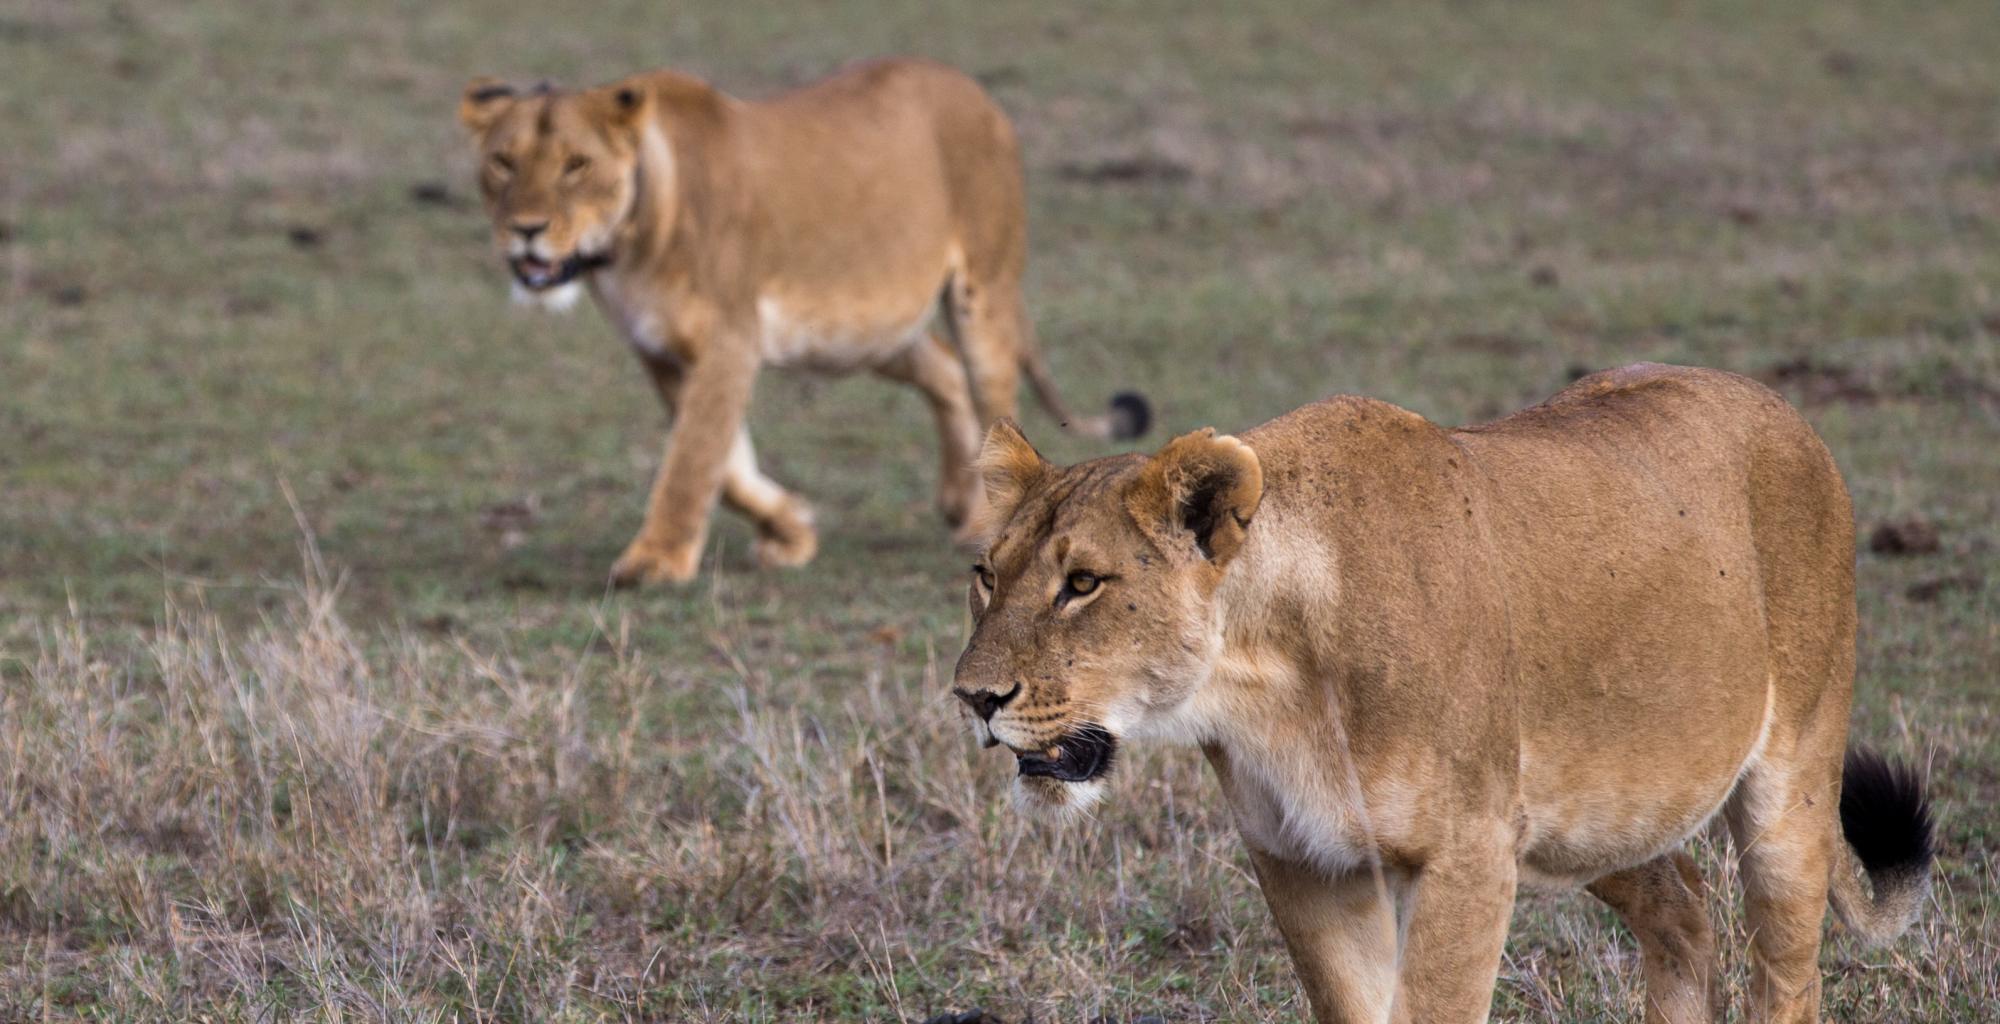 Borana-Conservancy-Wildlife-Lion-Simon-Morris